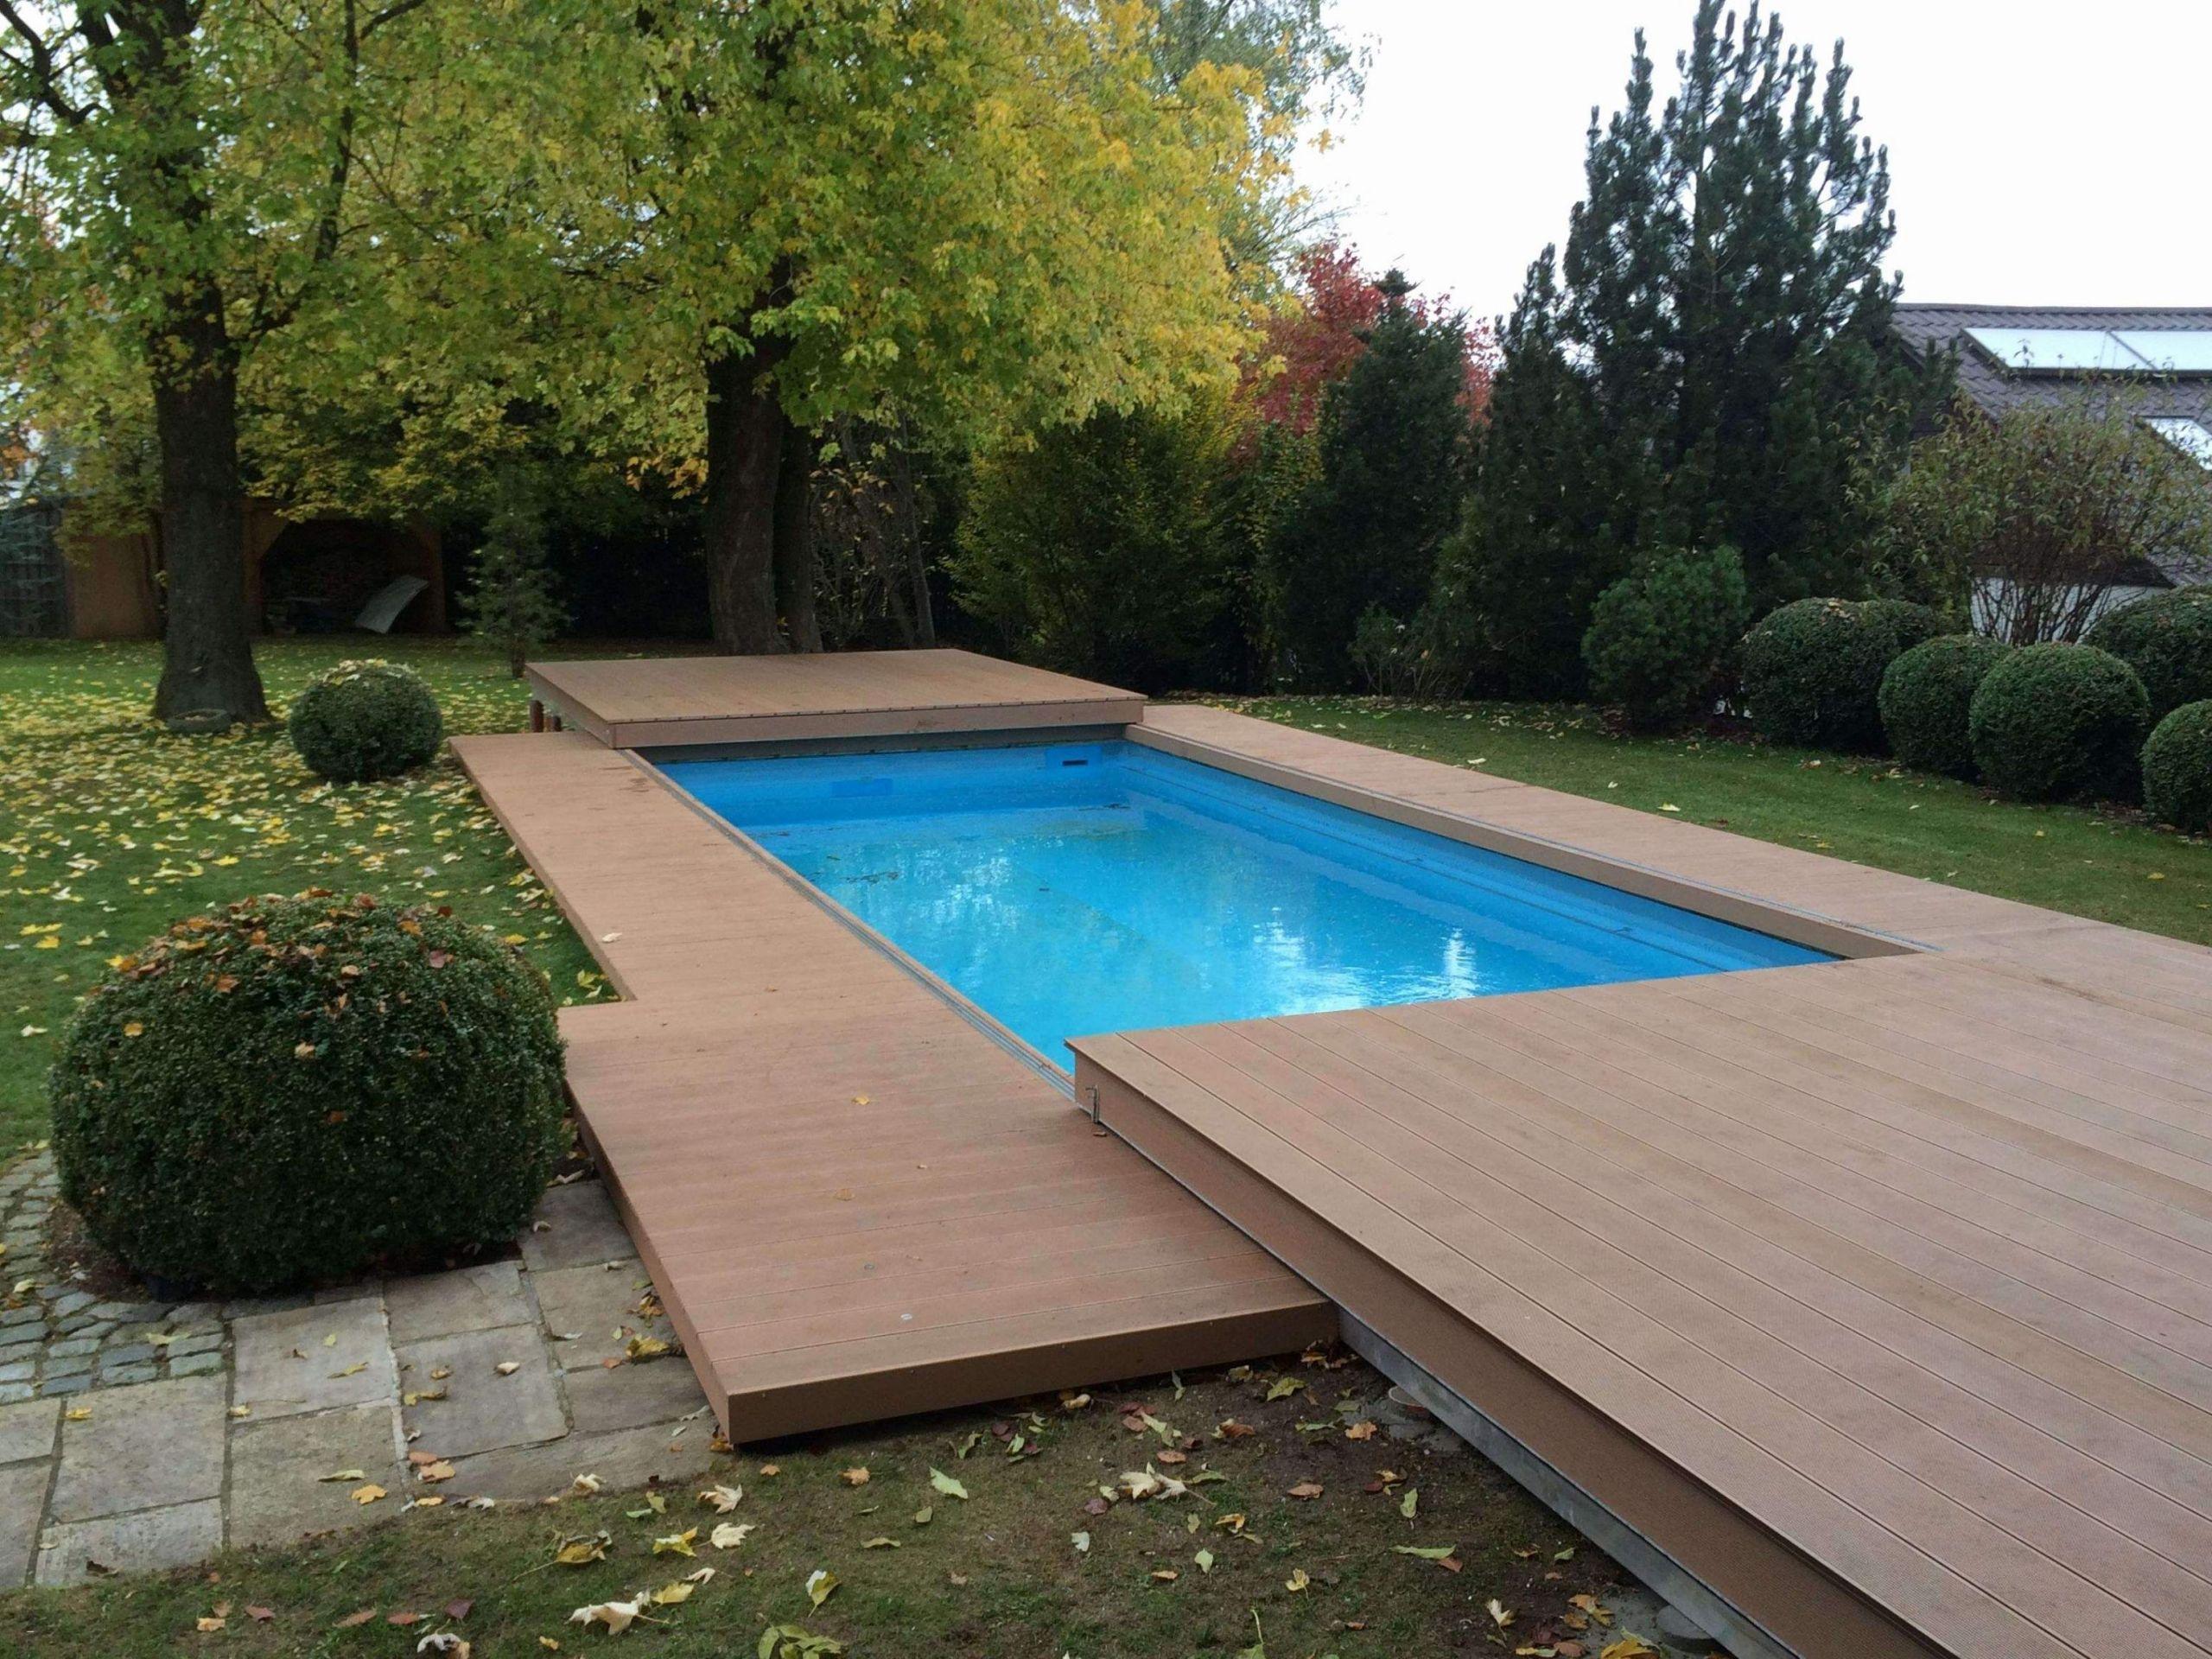 42 luxus gfk pool polen stock swimming pool in frankfurt swimming pool in frankfurt